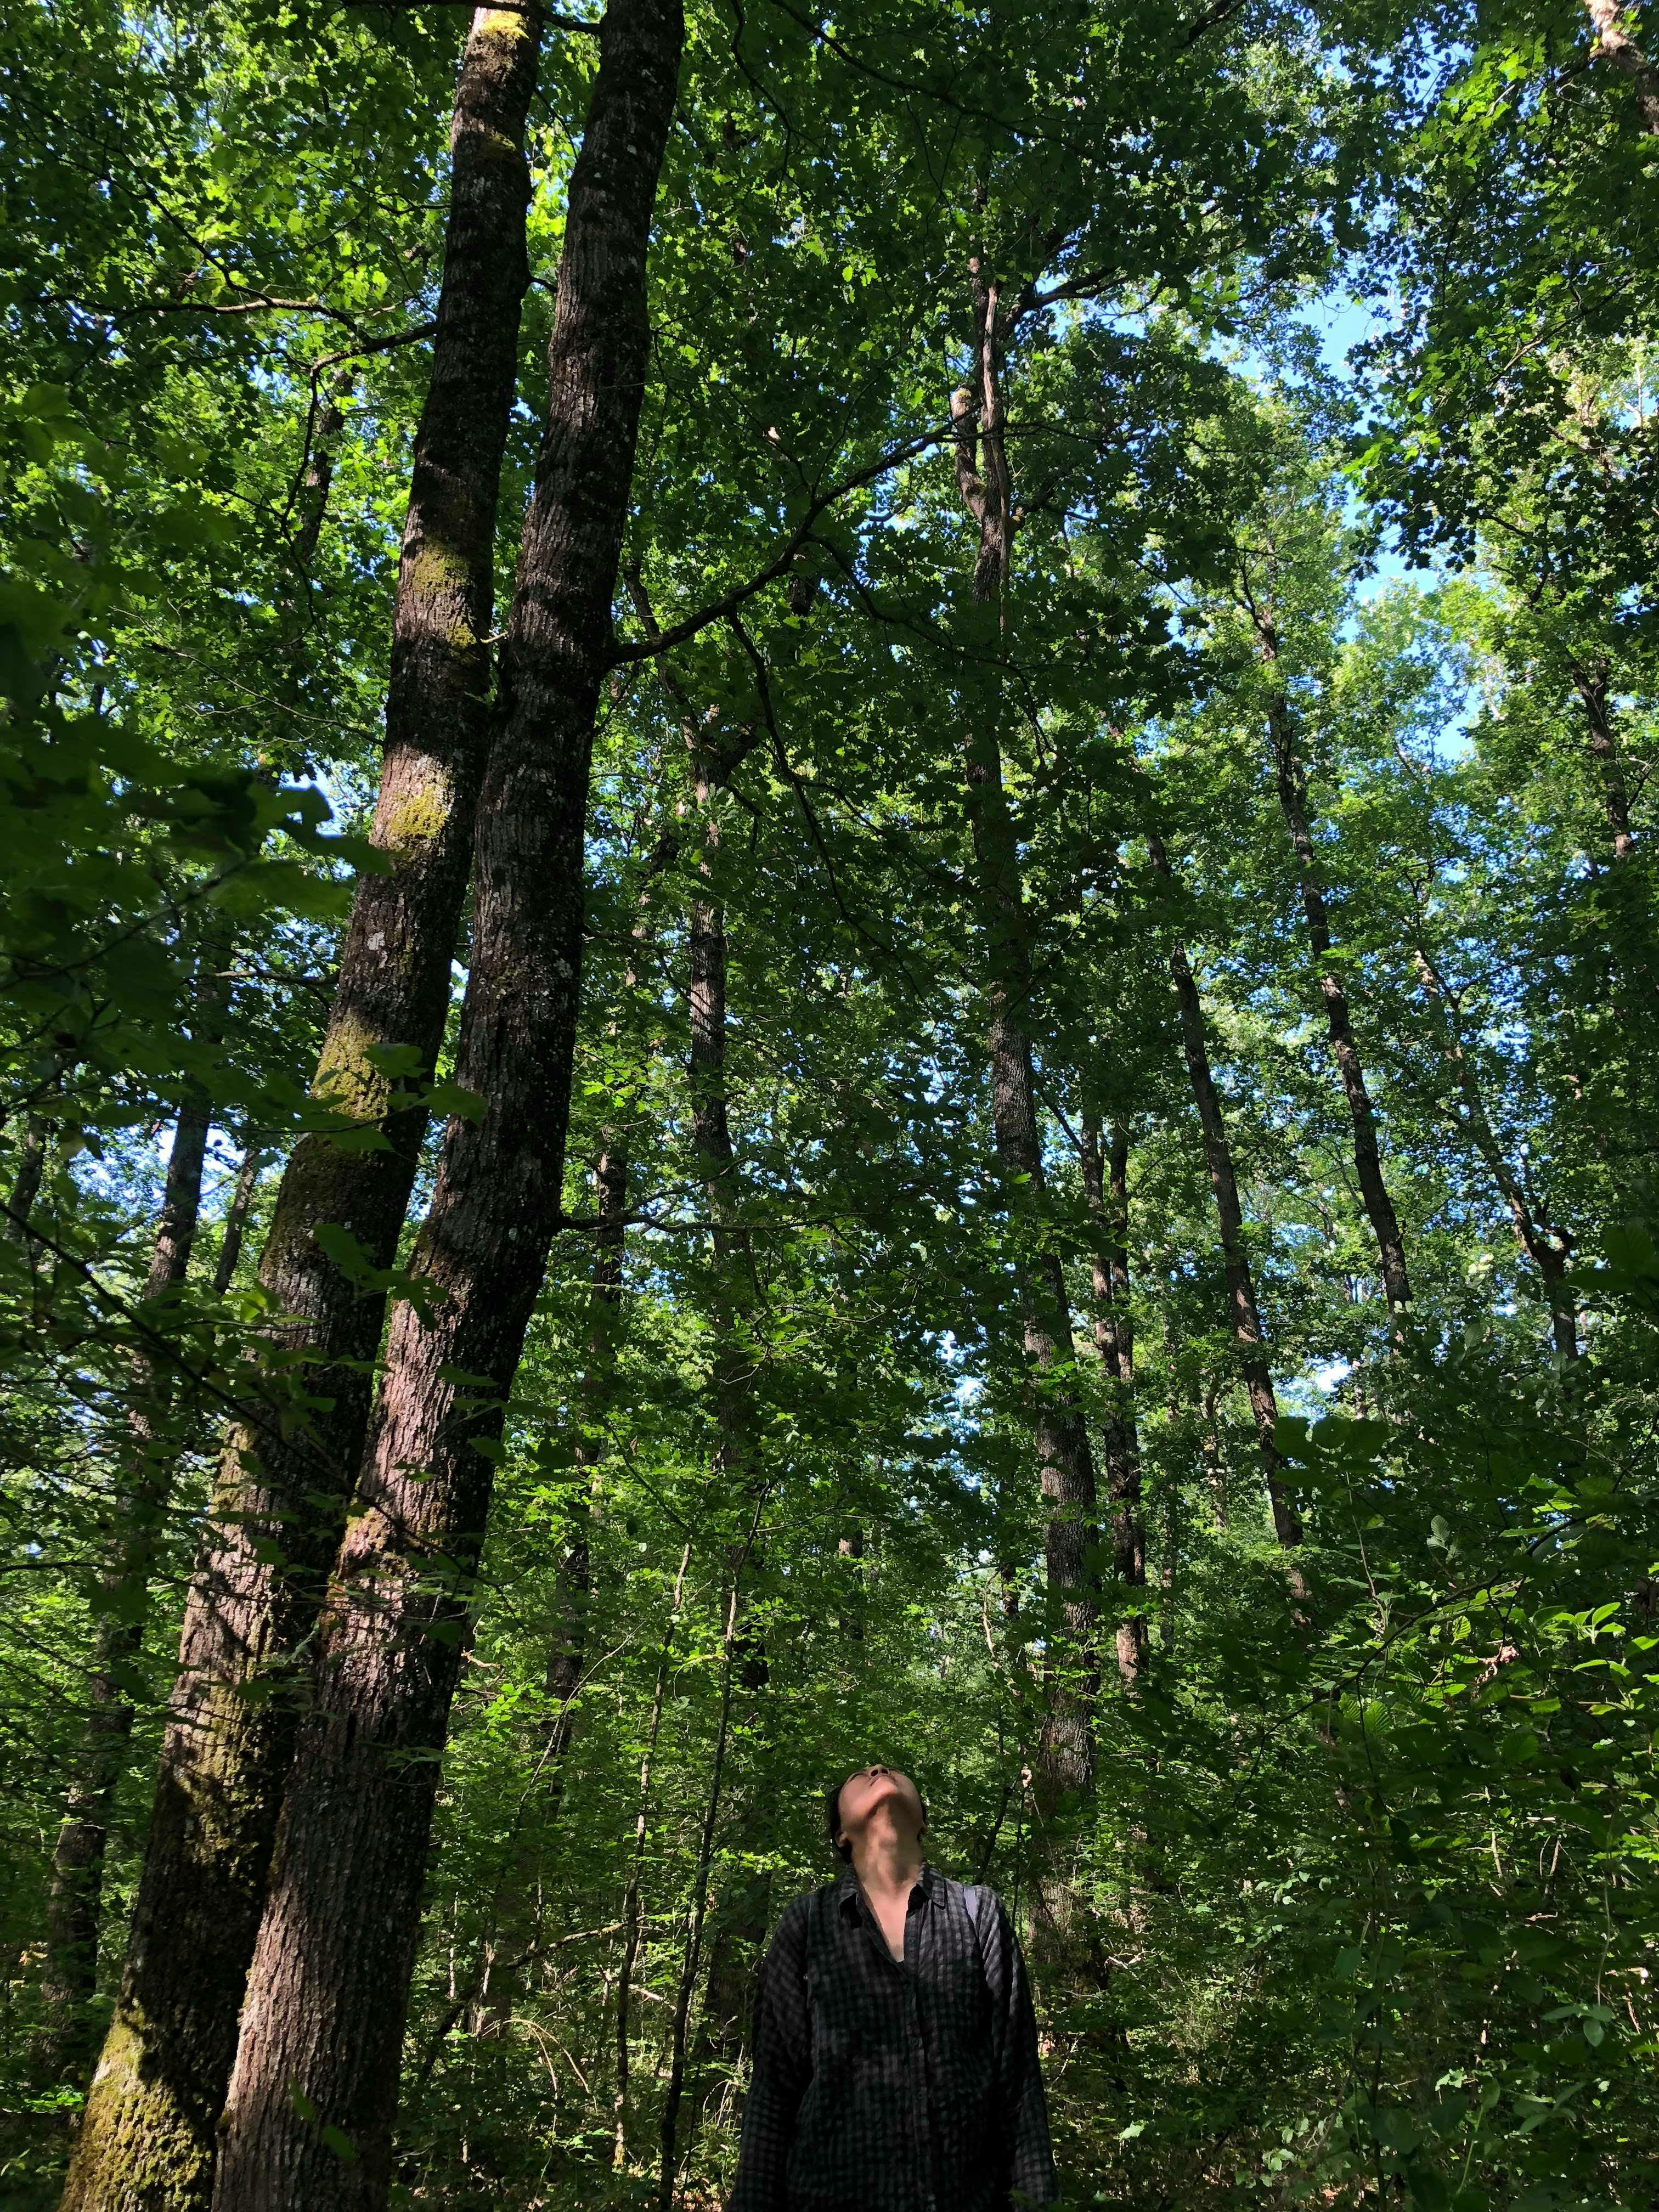 Balade en forêt-Le 26 mai 2018